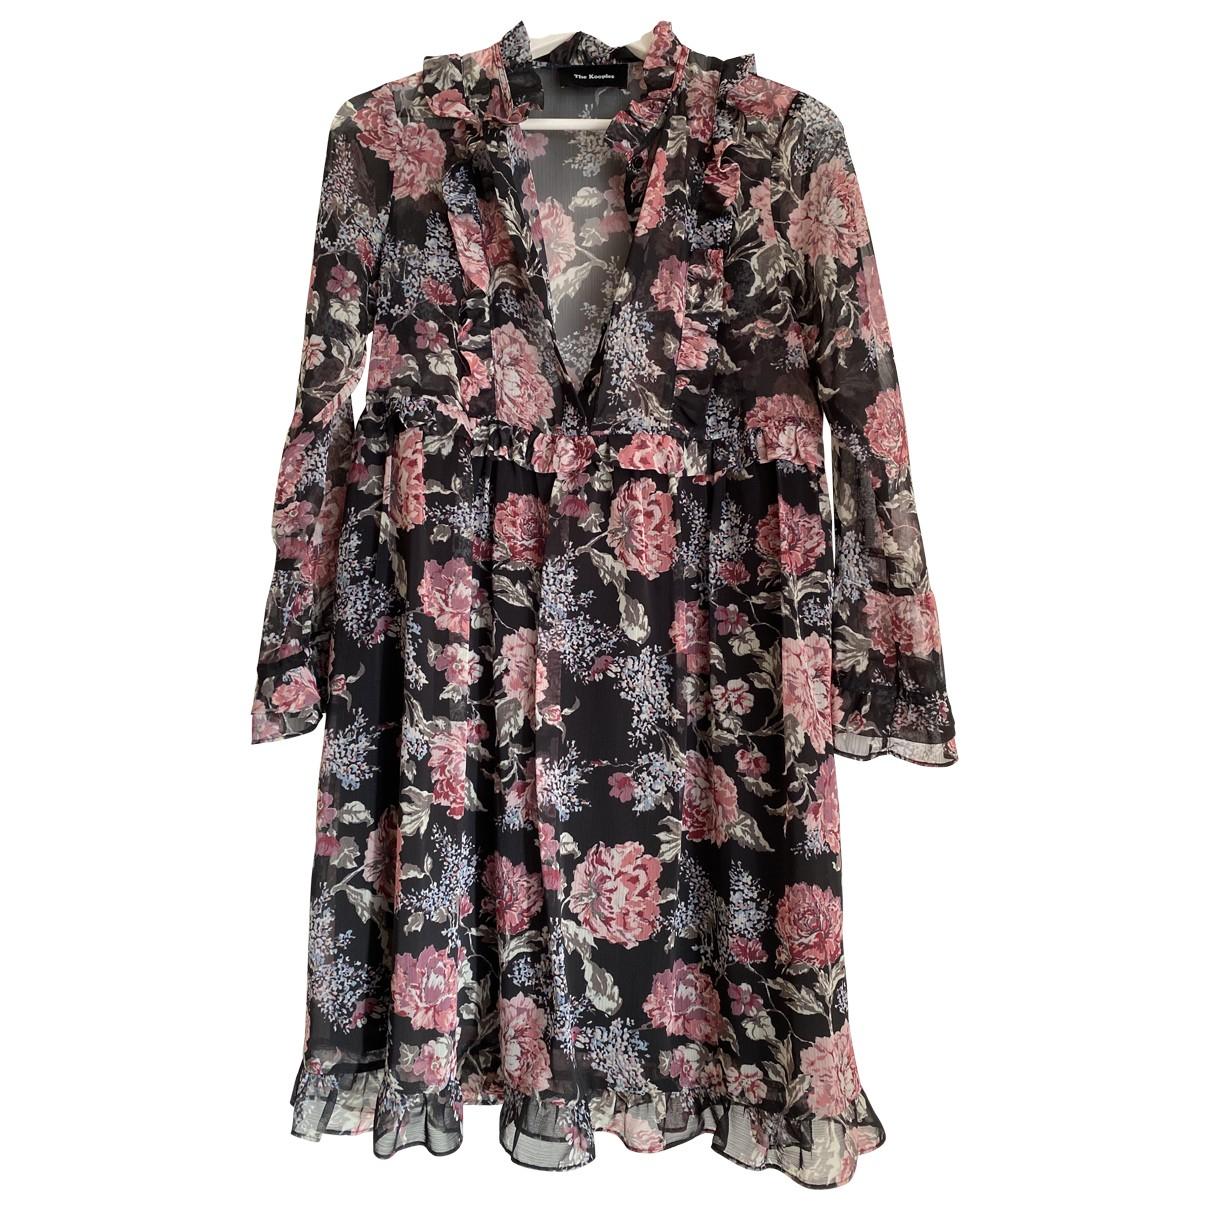 Mini vestido Fall Winter 2019 The Kooples